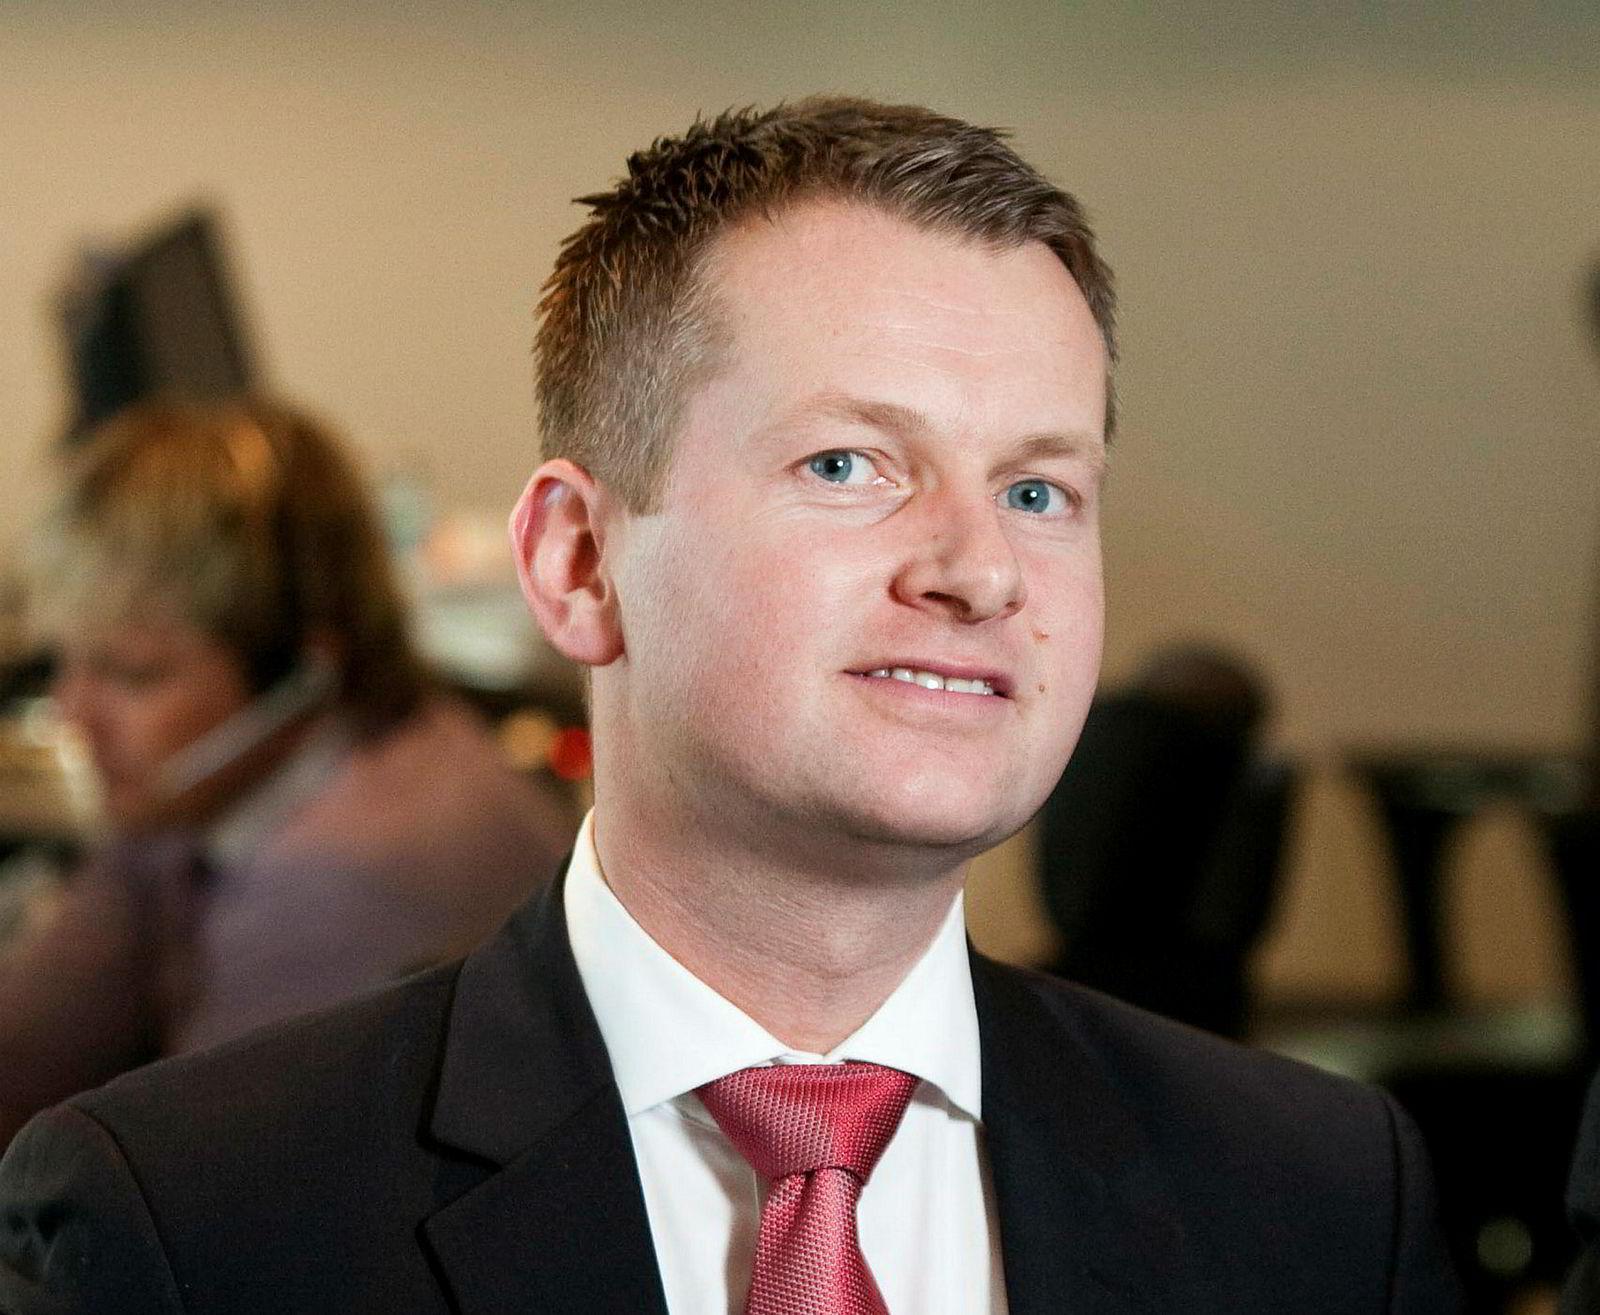 Endre Tangenes er medgründer i The Nordic Group.